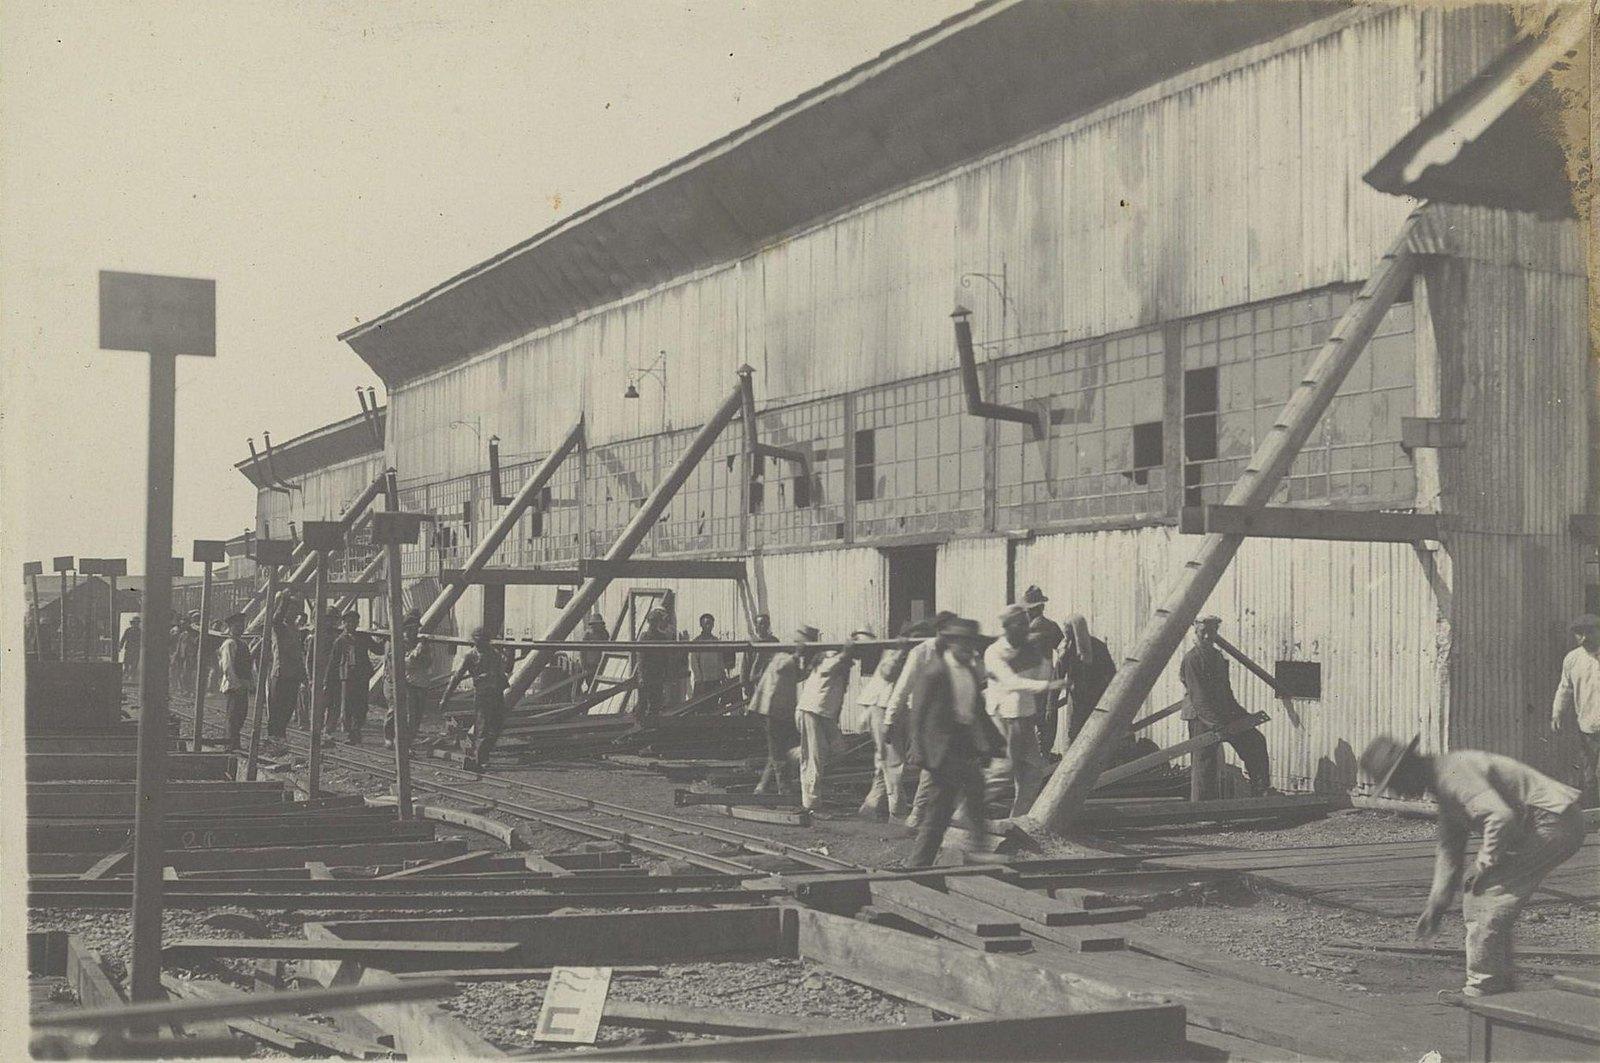 83. Подача частей каркаса из склада через люки в стенах ангаров на шаблоны